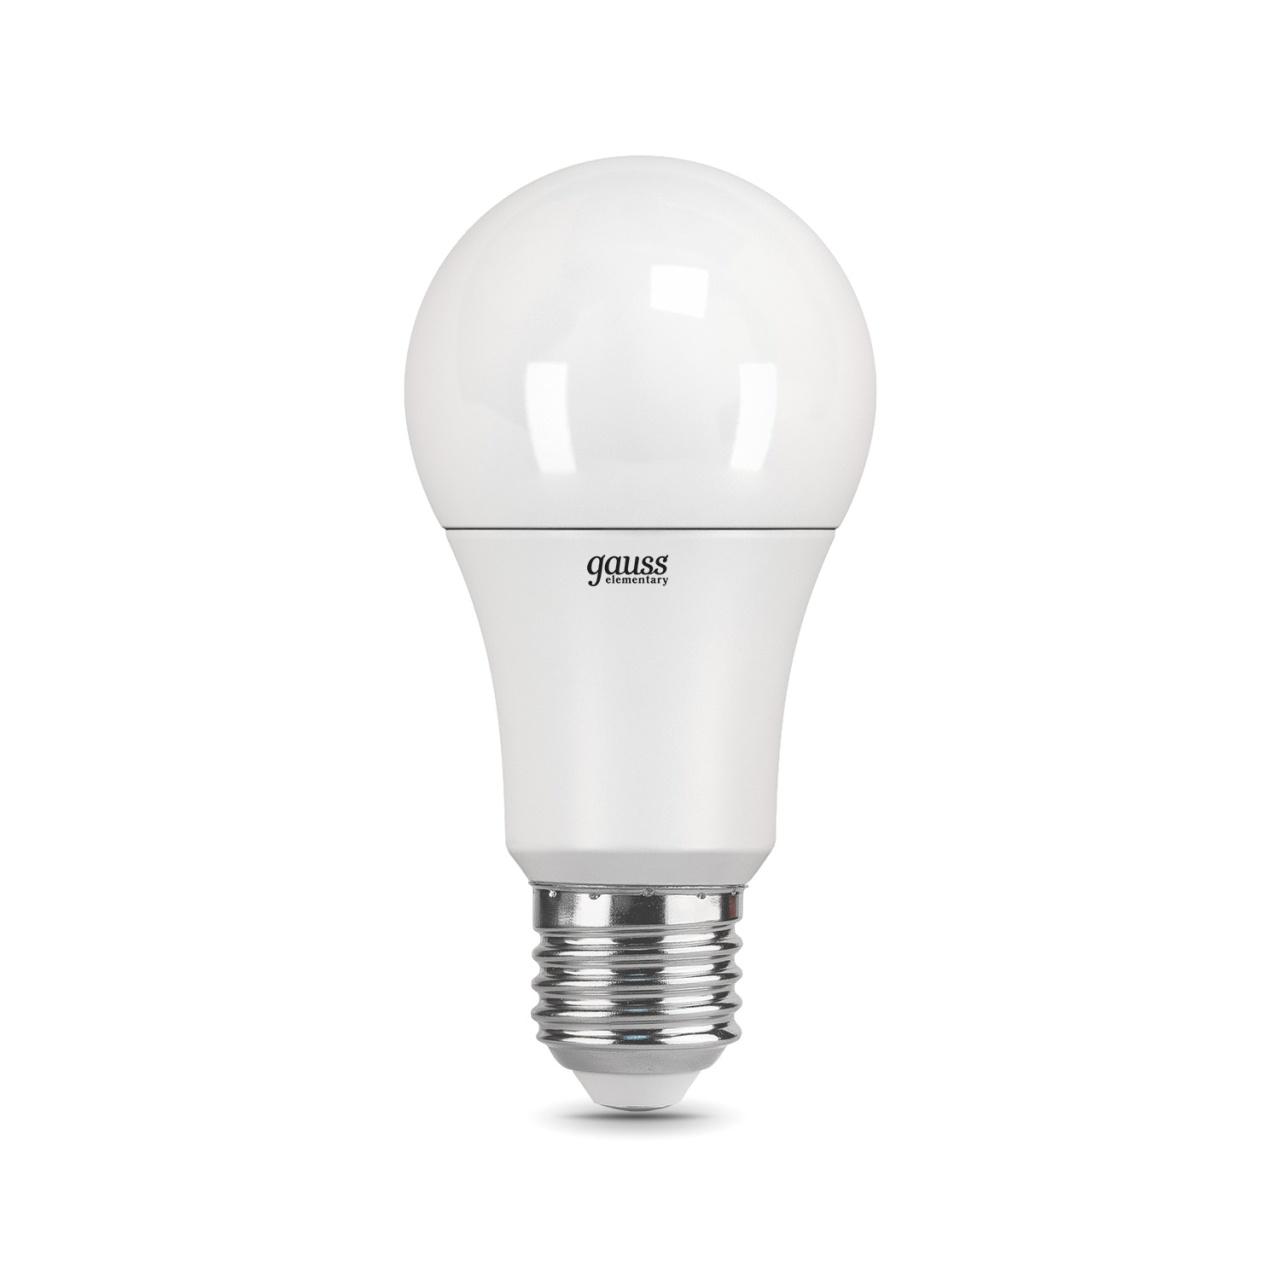 цена Лампочка Gauss 23215 Elementary A60 онлайн в 2017 году